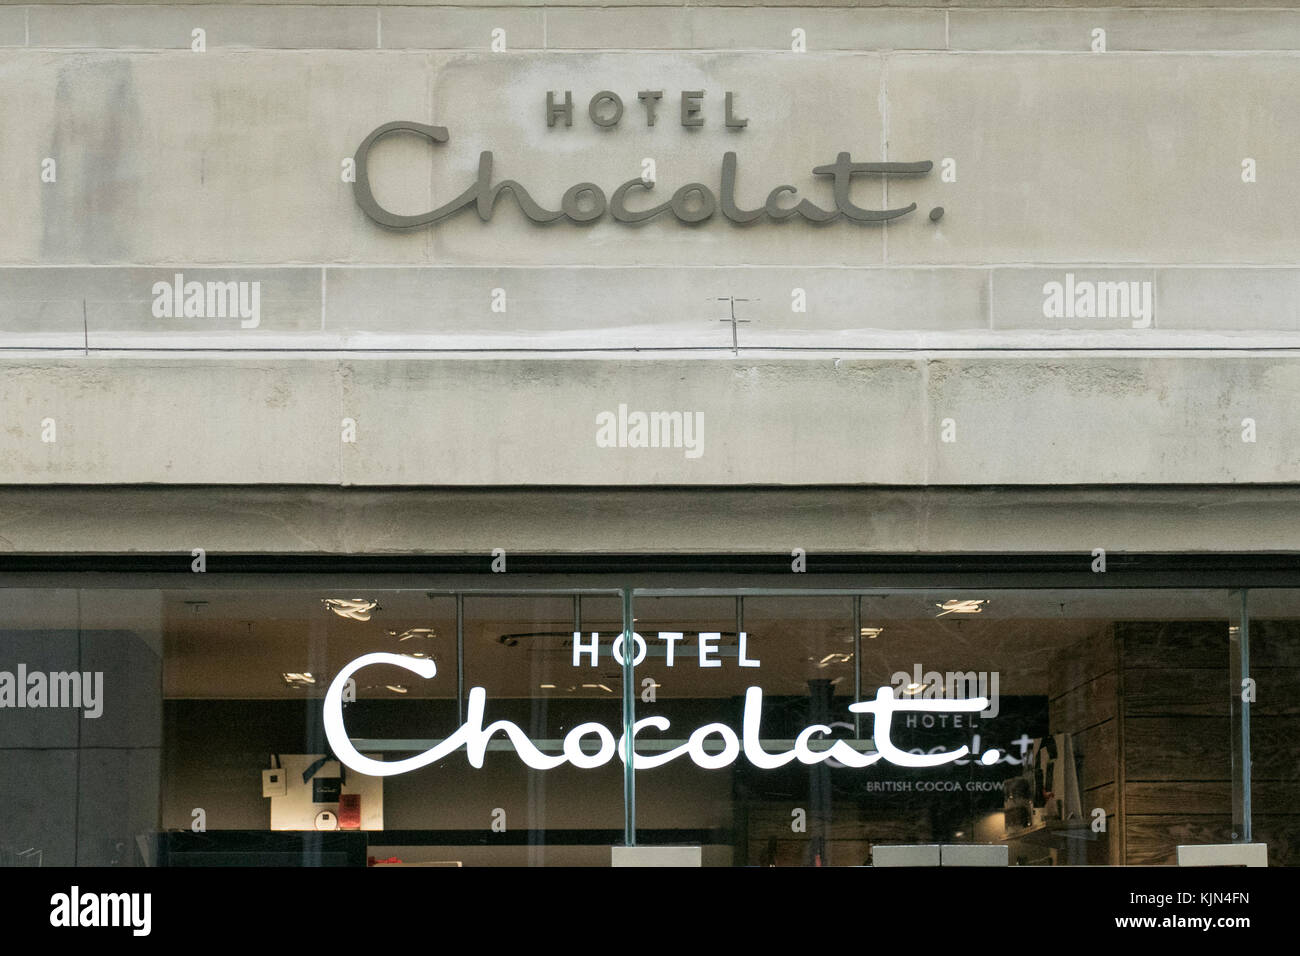 Hotel Chocolate Stock Photos Amp Hotel Chocolate Stock